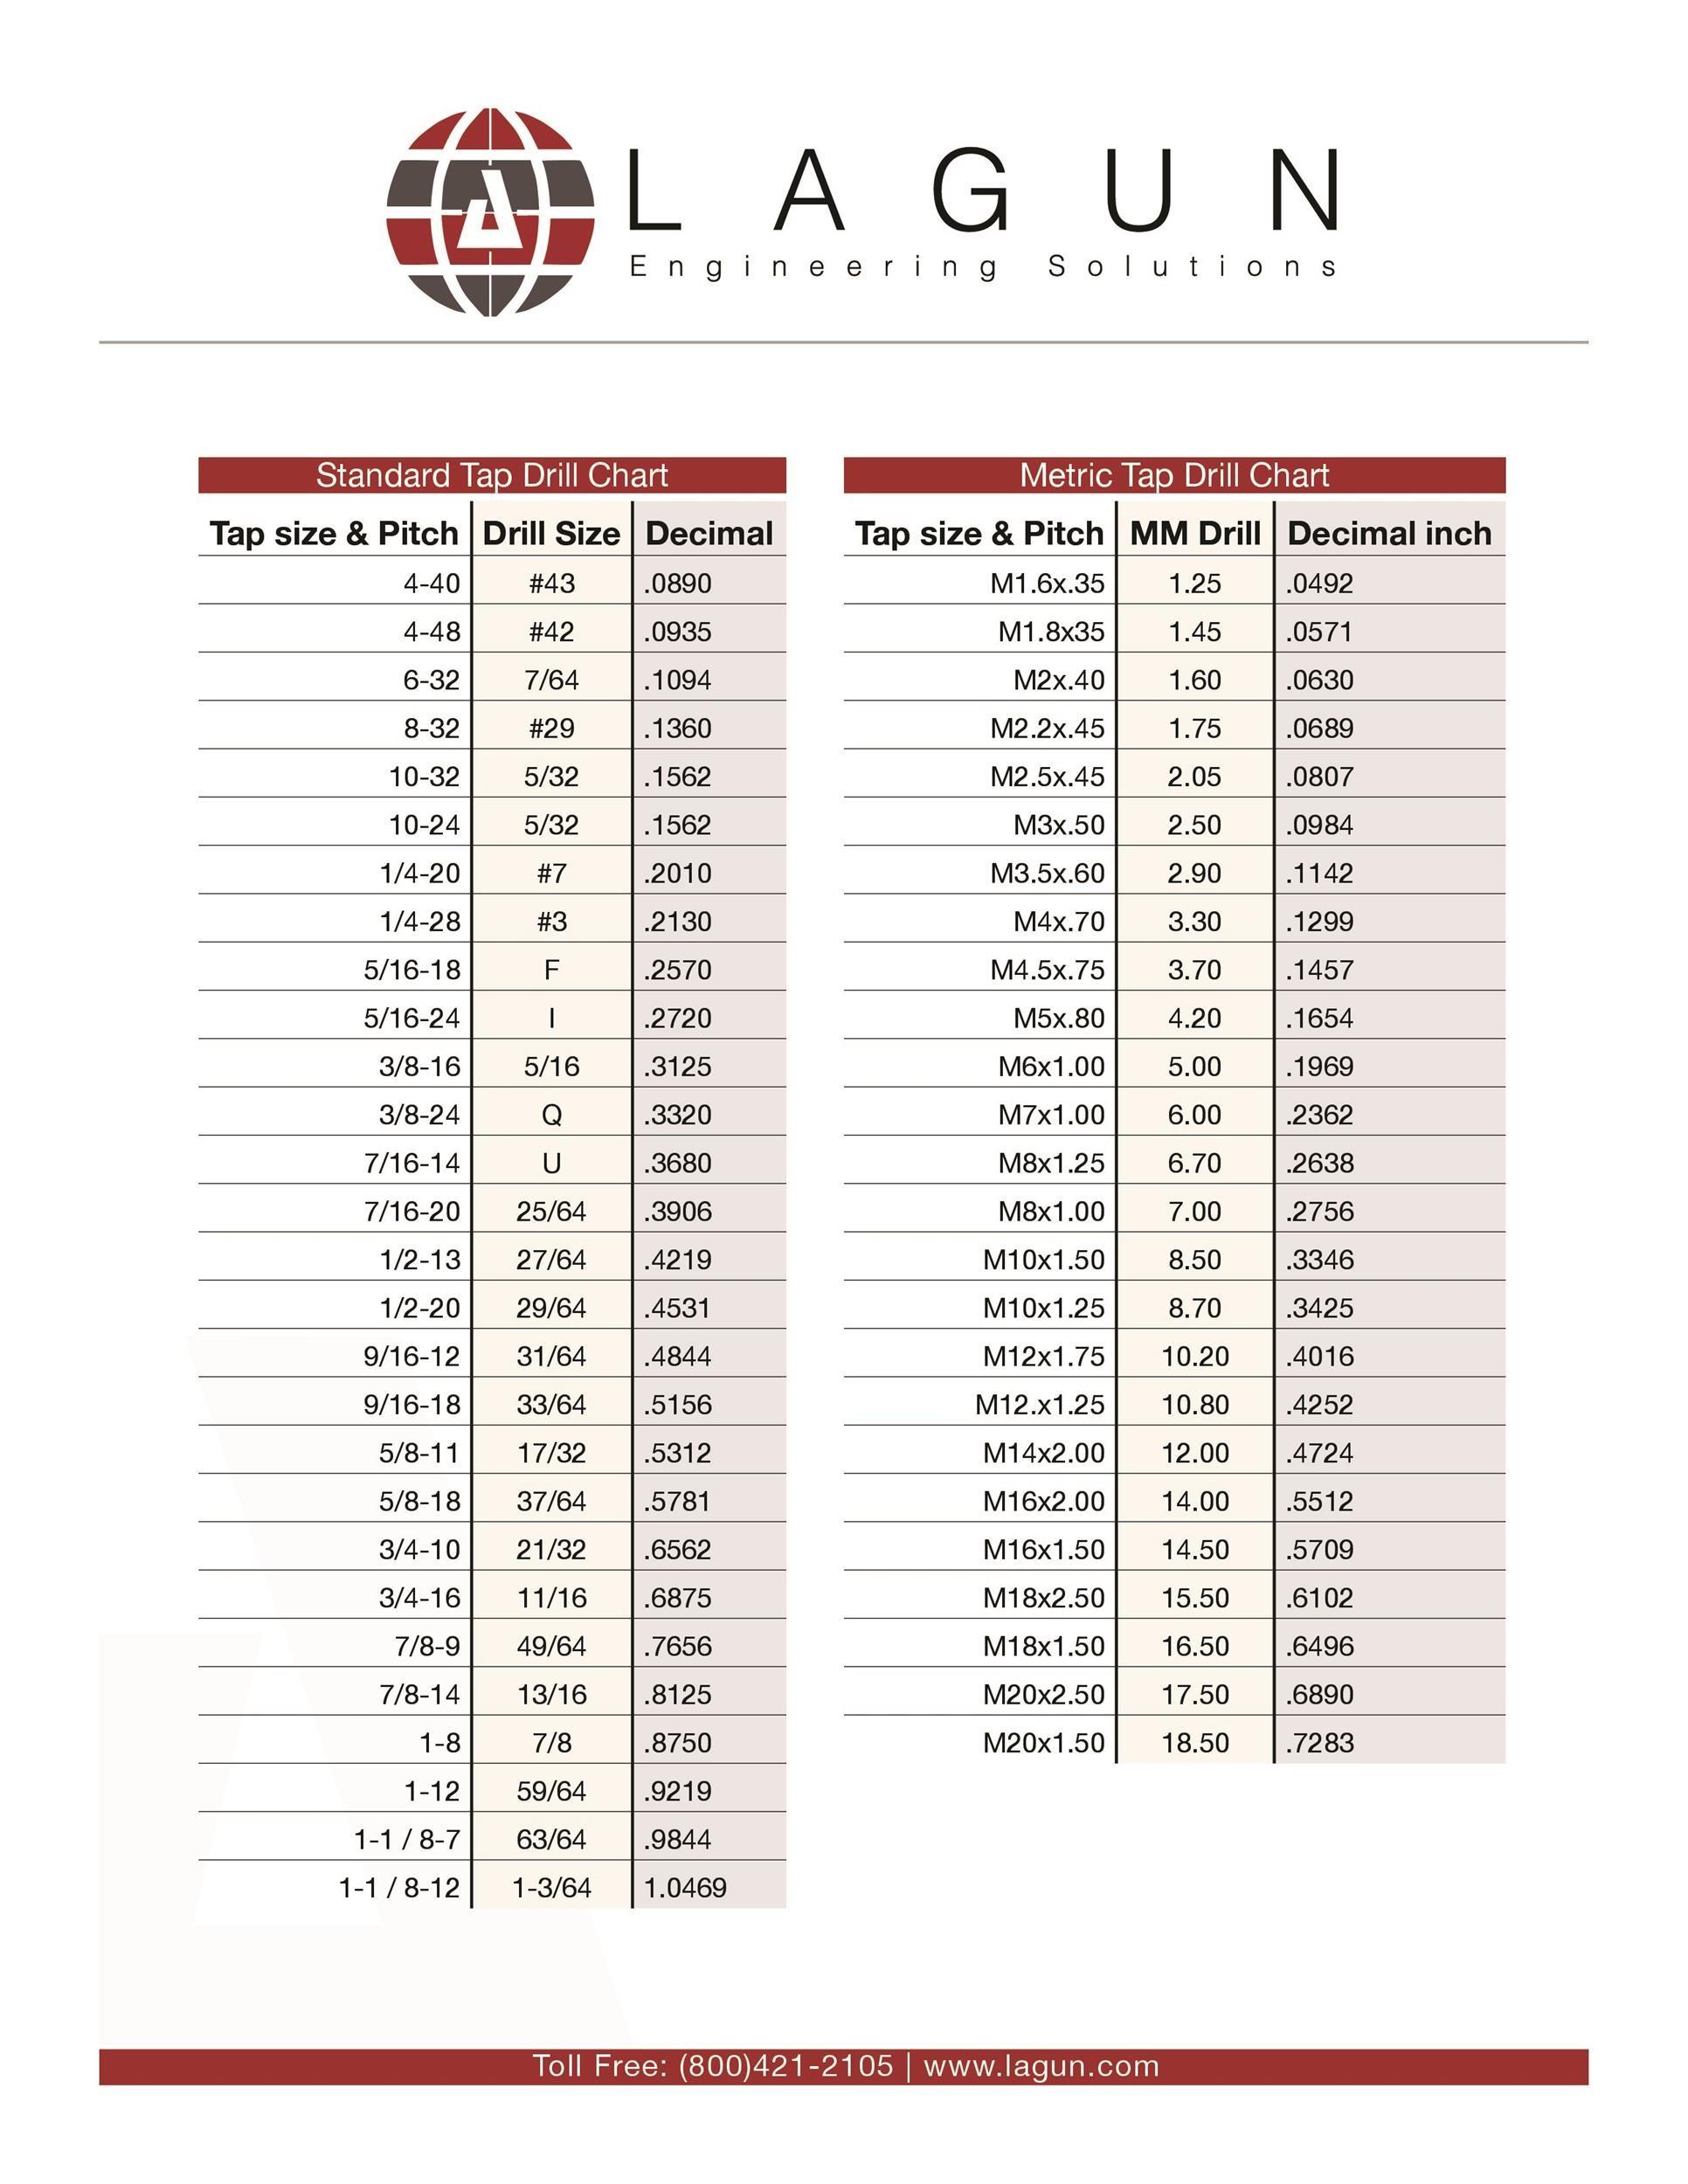 23 Printable Tap Drill Charts [PDF] ᐅ Template Lab